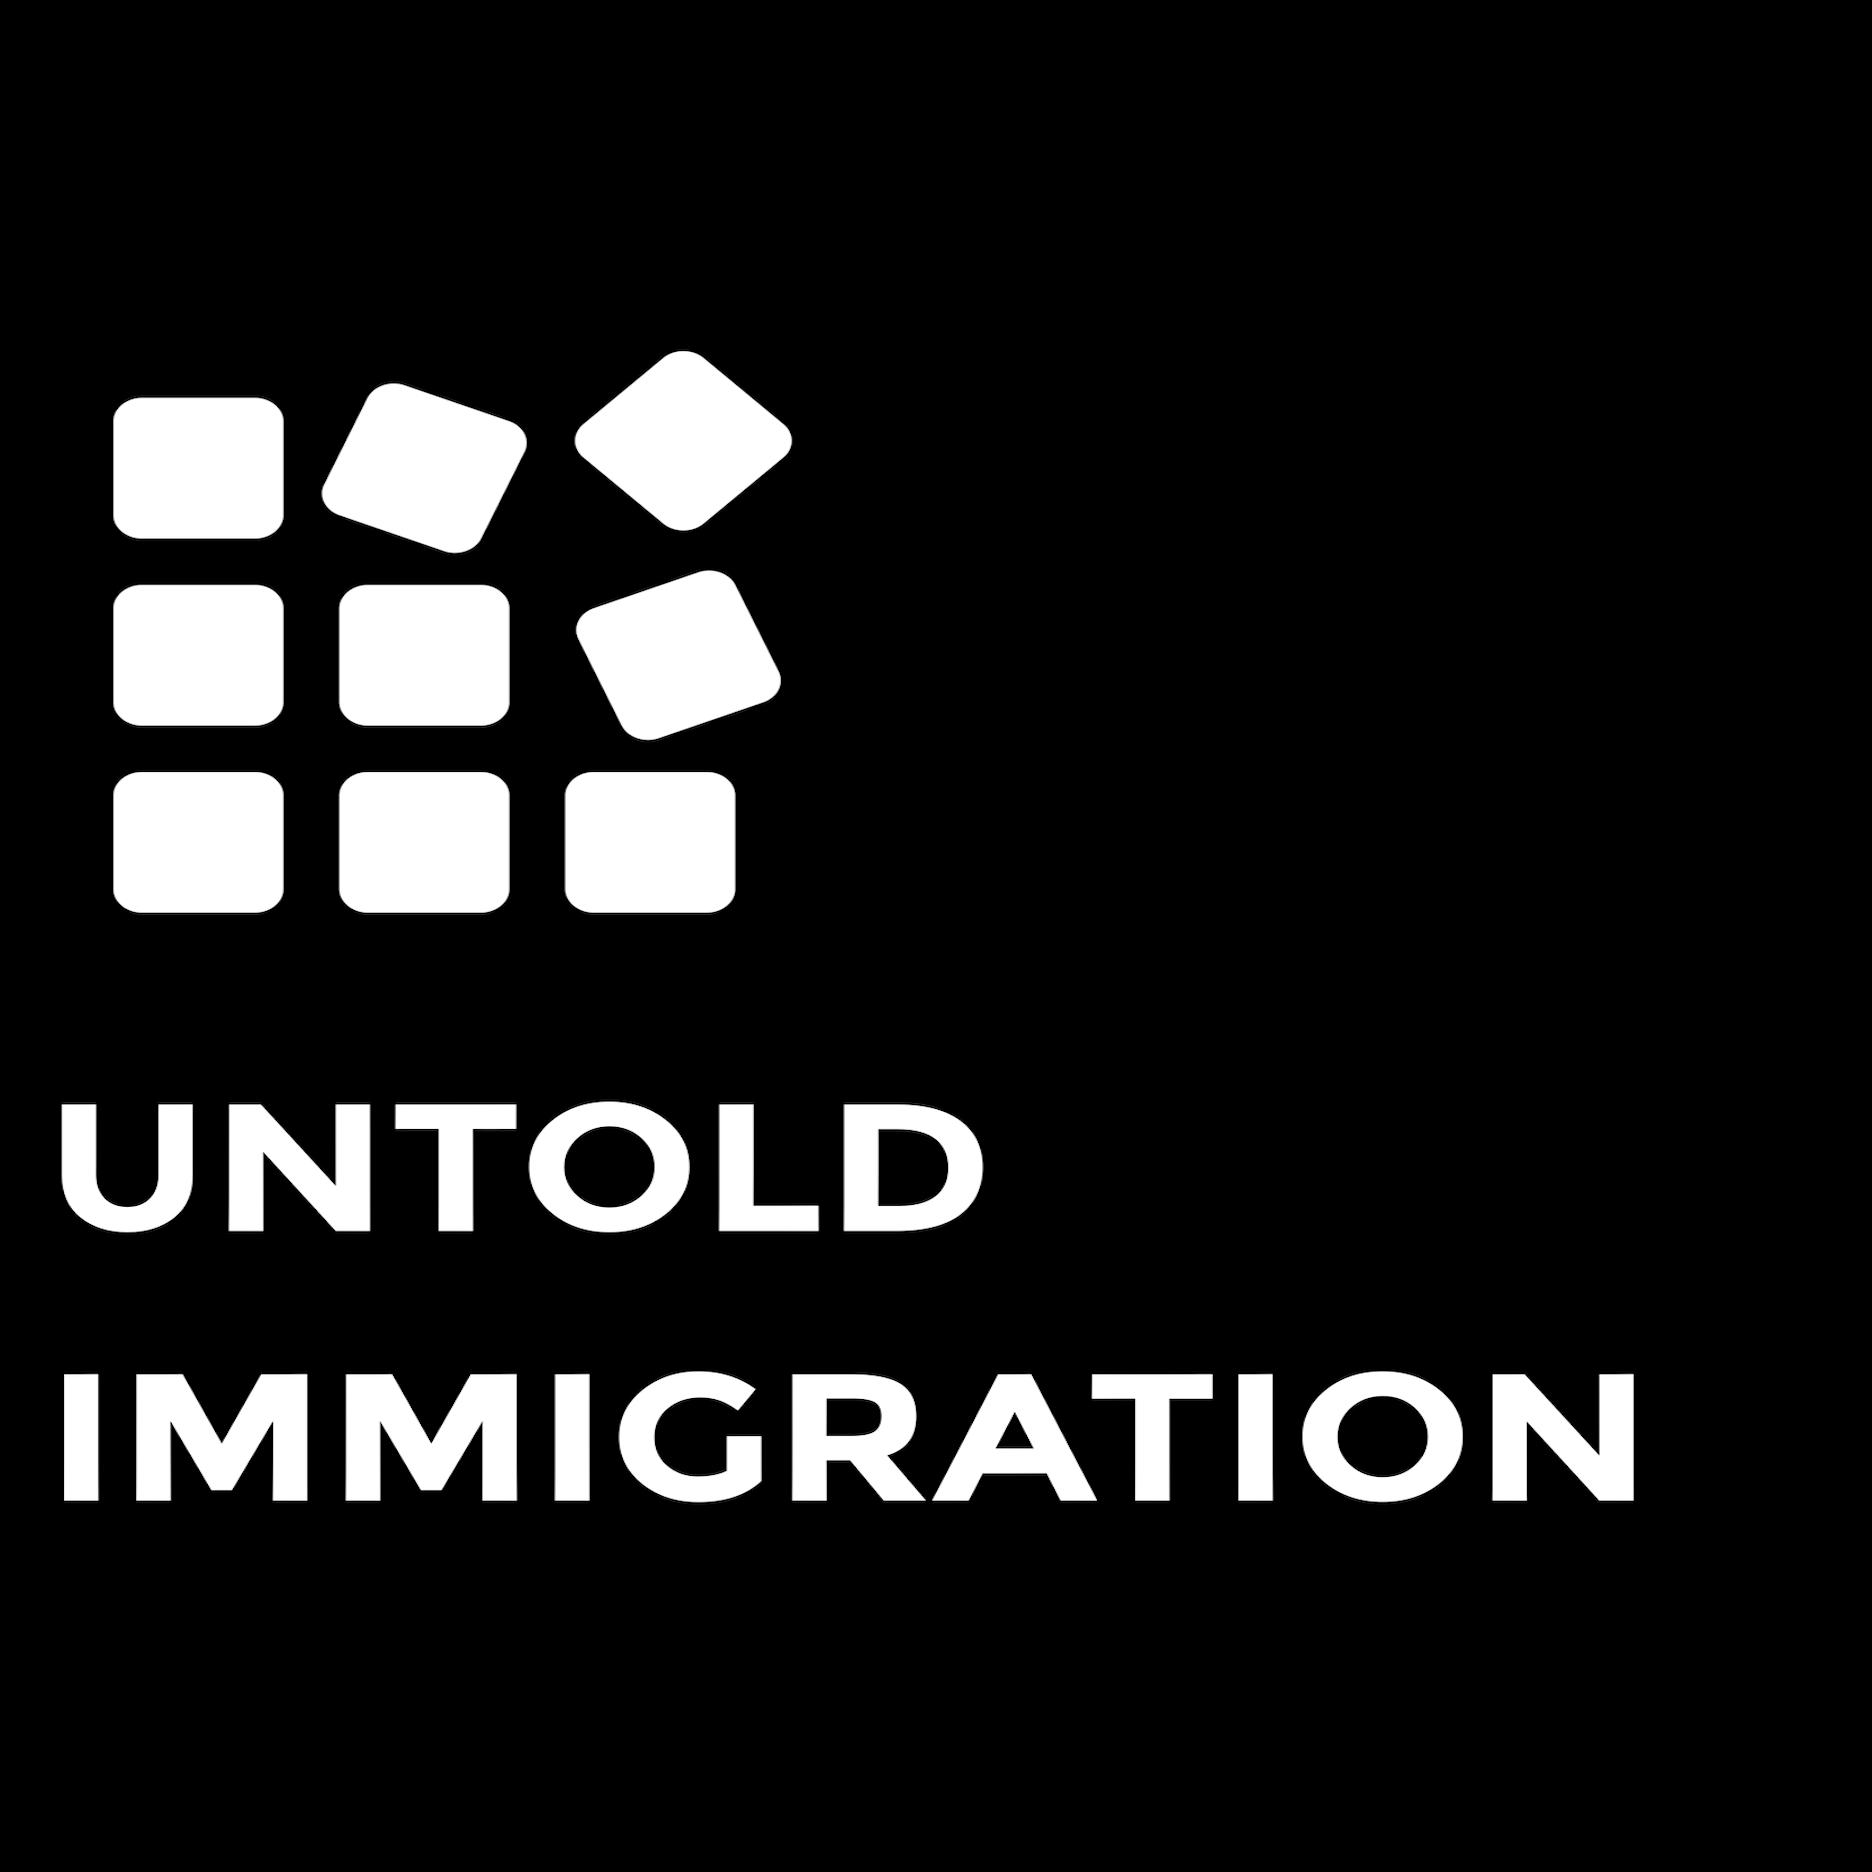 Show artwork for Untold Immigration